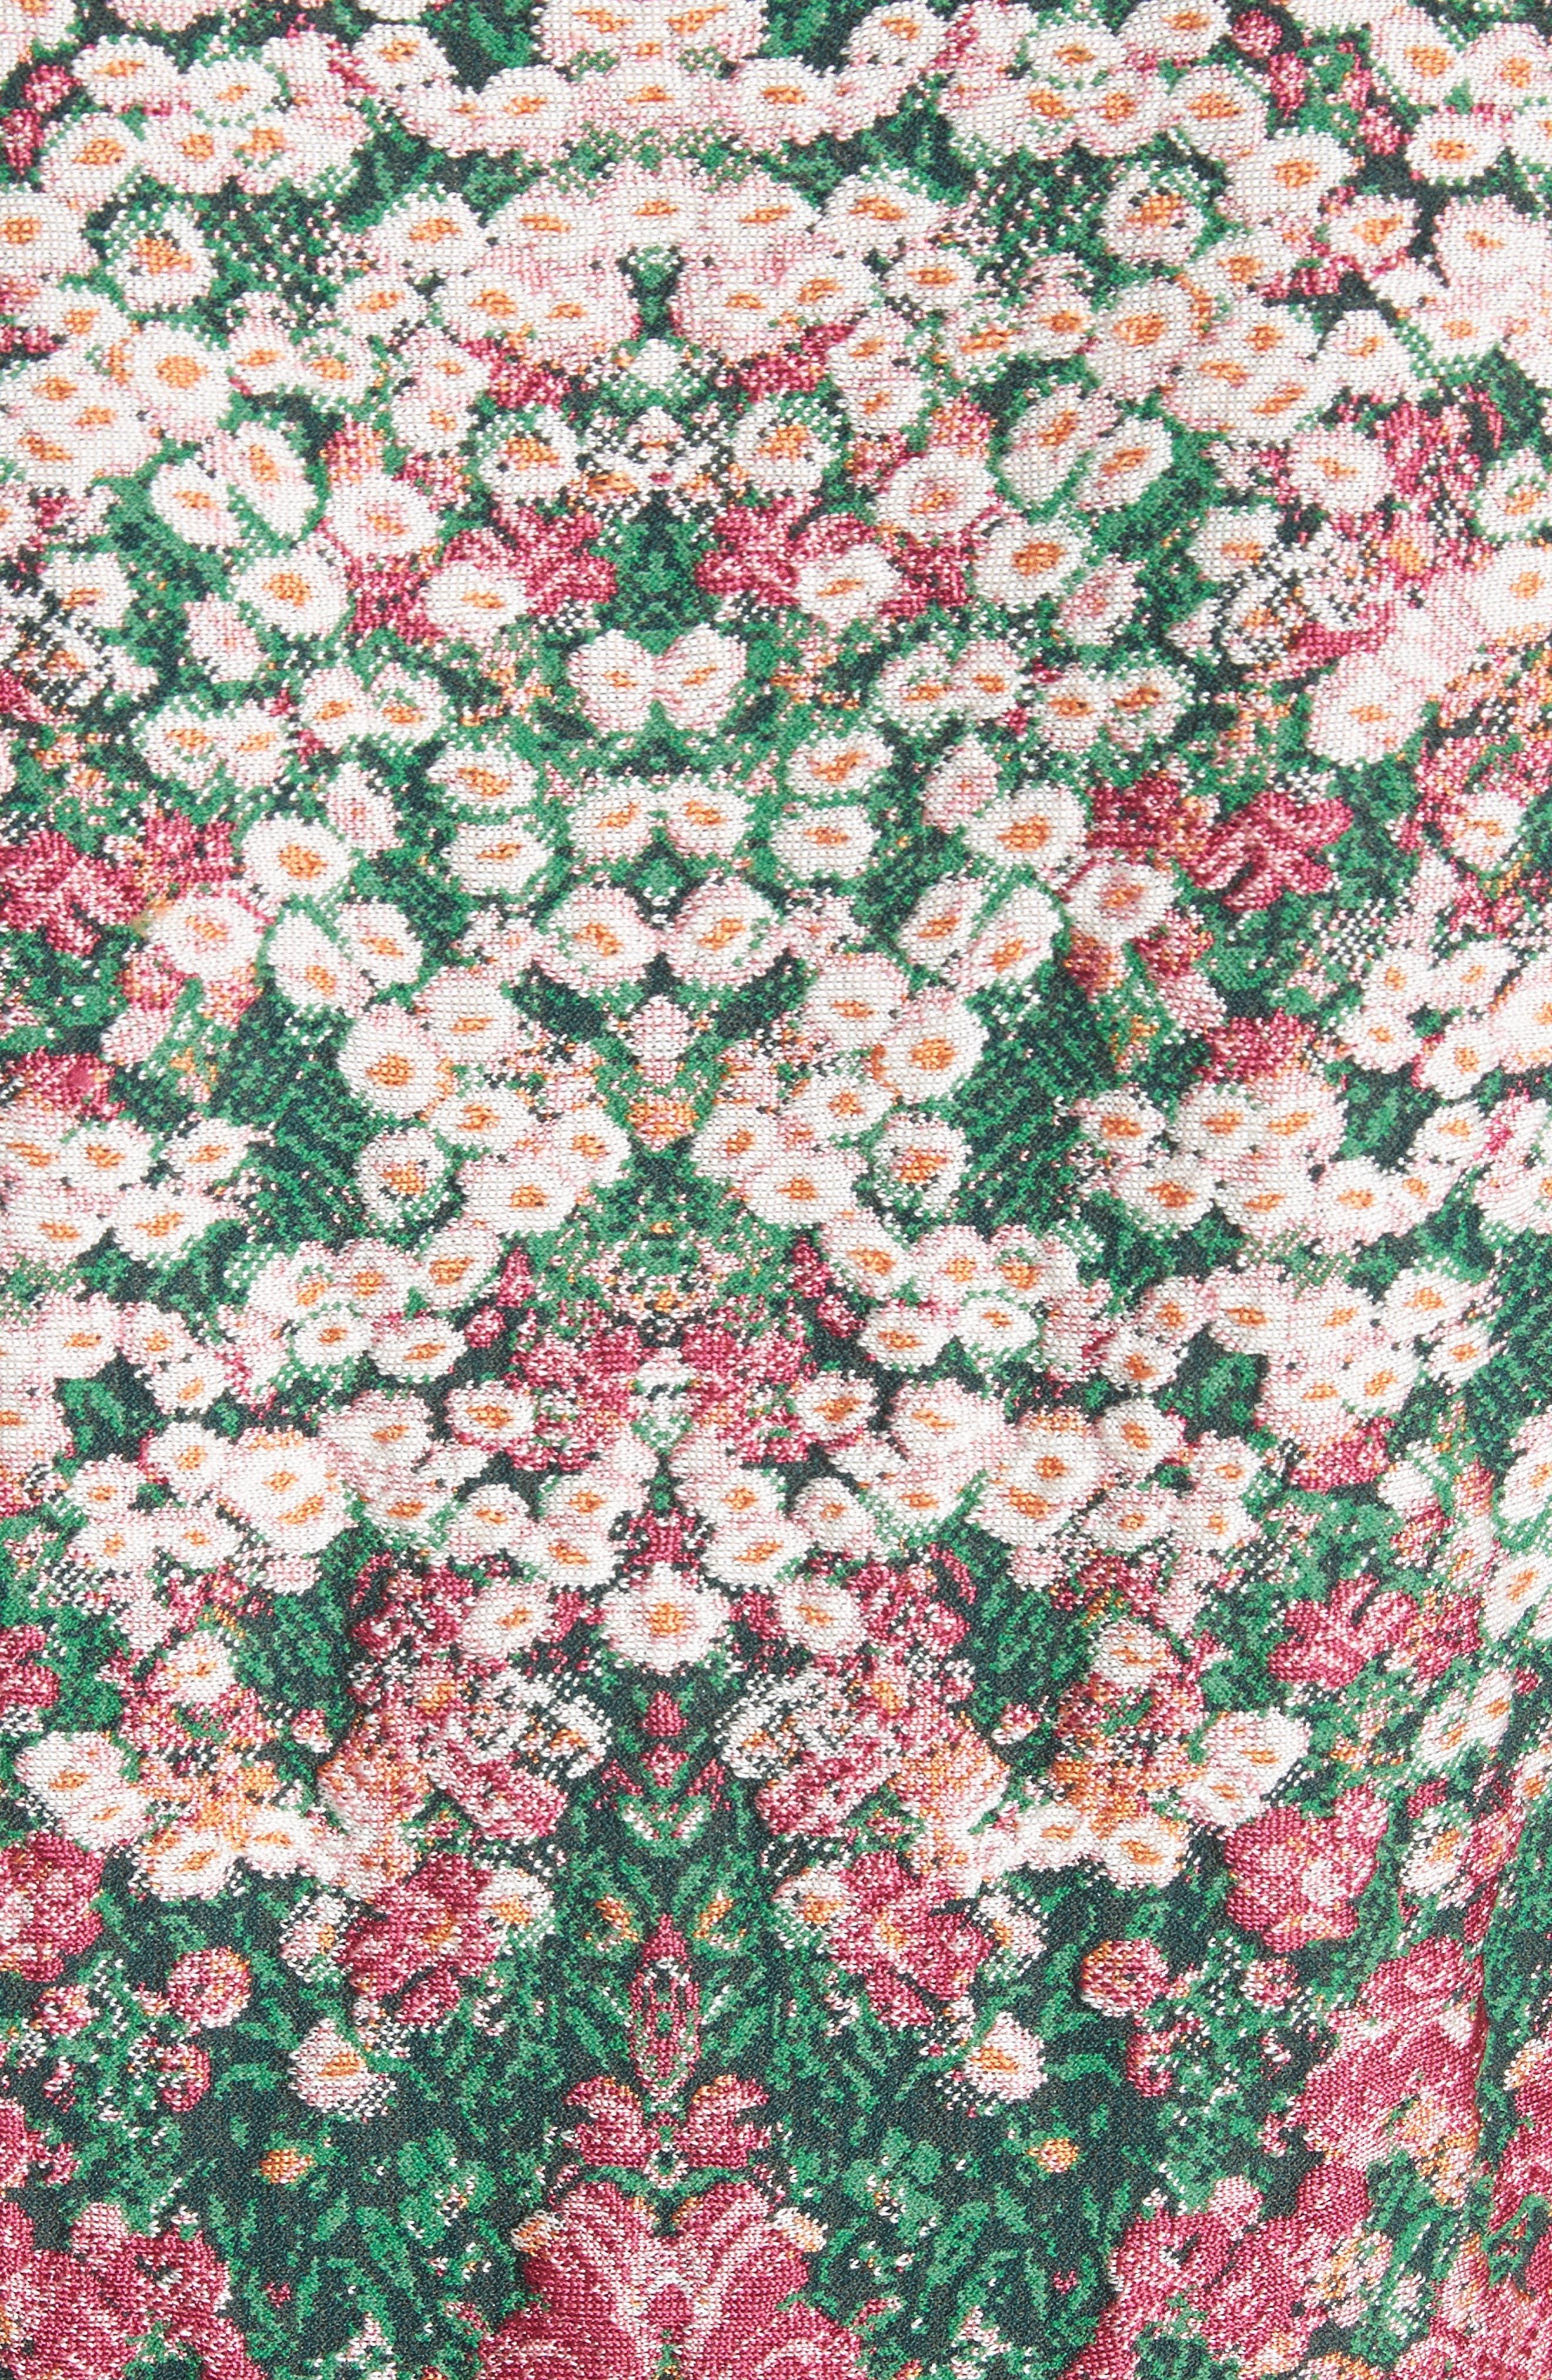 Floral Jacquard Knit Fit & Flare Dress,                             Alternate thumbnail 5, color,                             Multicolor